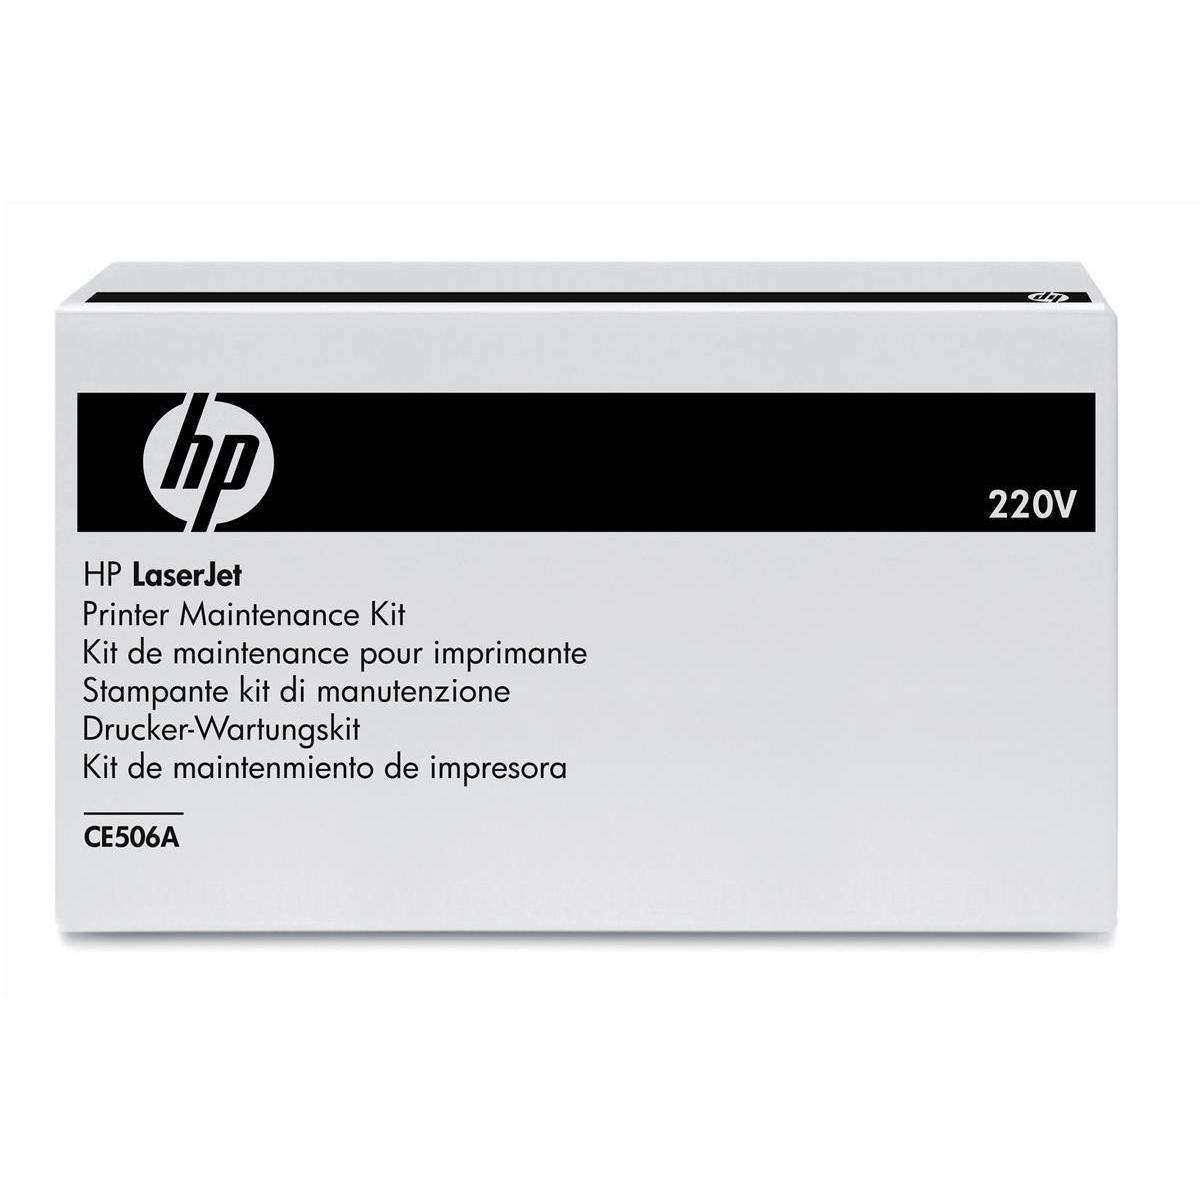 Image for Hewlett Packard [HP] 504A CLJ Colour Laser Fuser Unit Ref CE506A